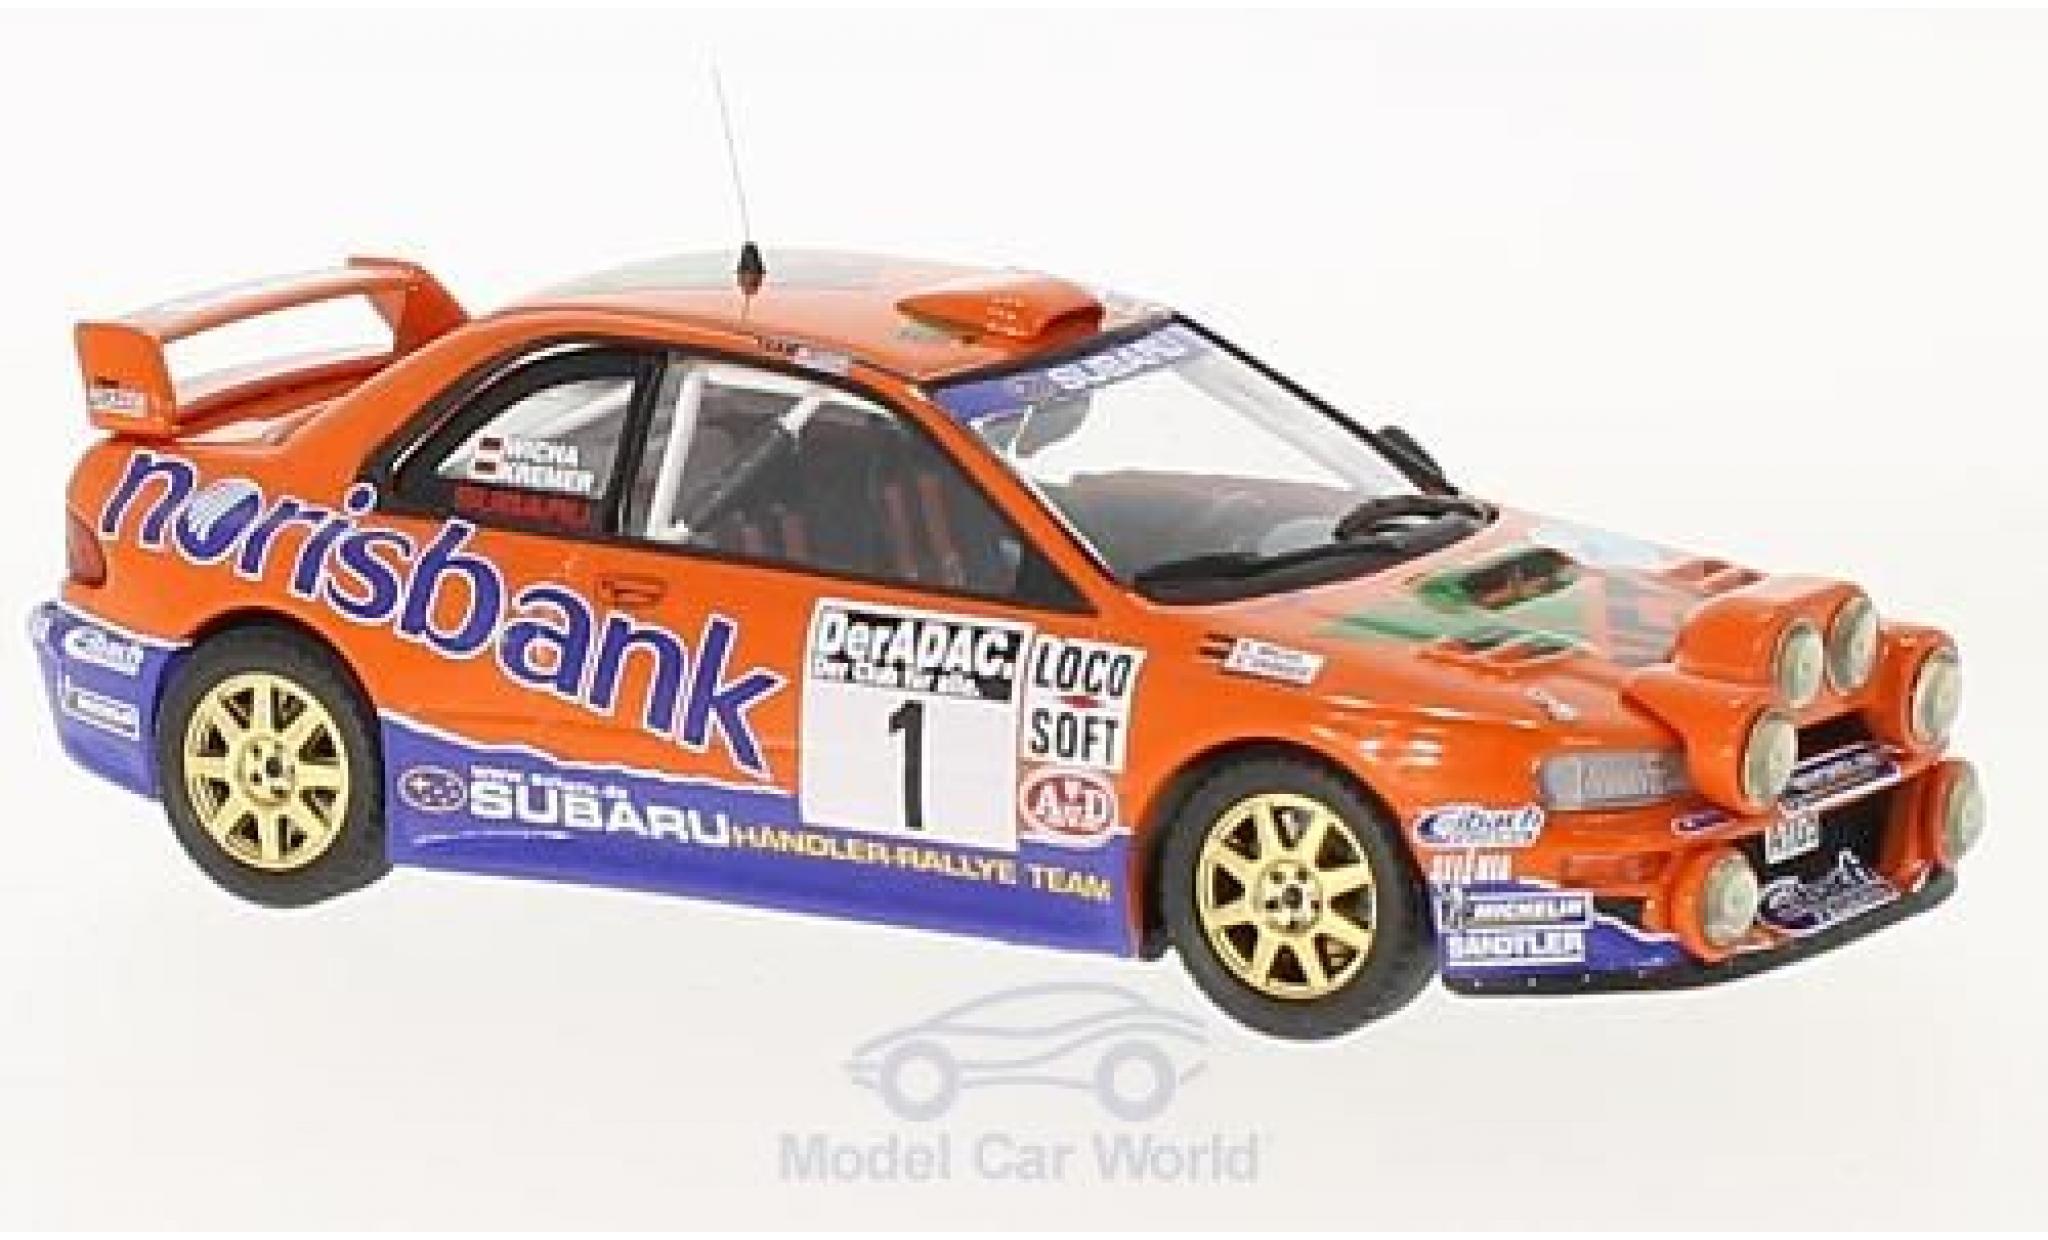 Subaru Impreza WRC 1/43 Trofeu S4 98 No.1 Norisbank Rallye DM Rallye Deutschland 2000 mit Zusatzscheinwerfer A.Kremer/K.Wicha